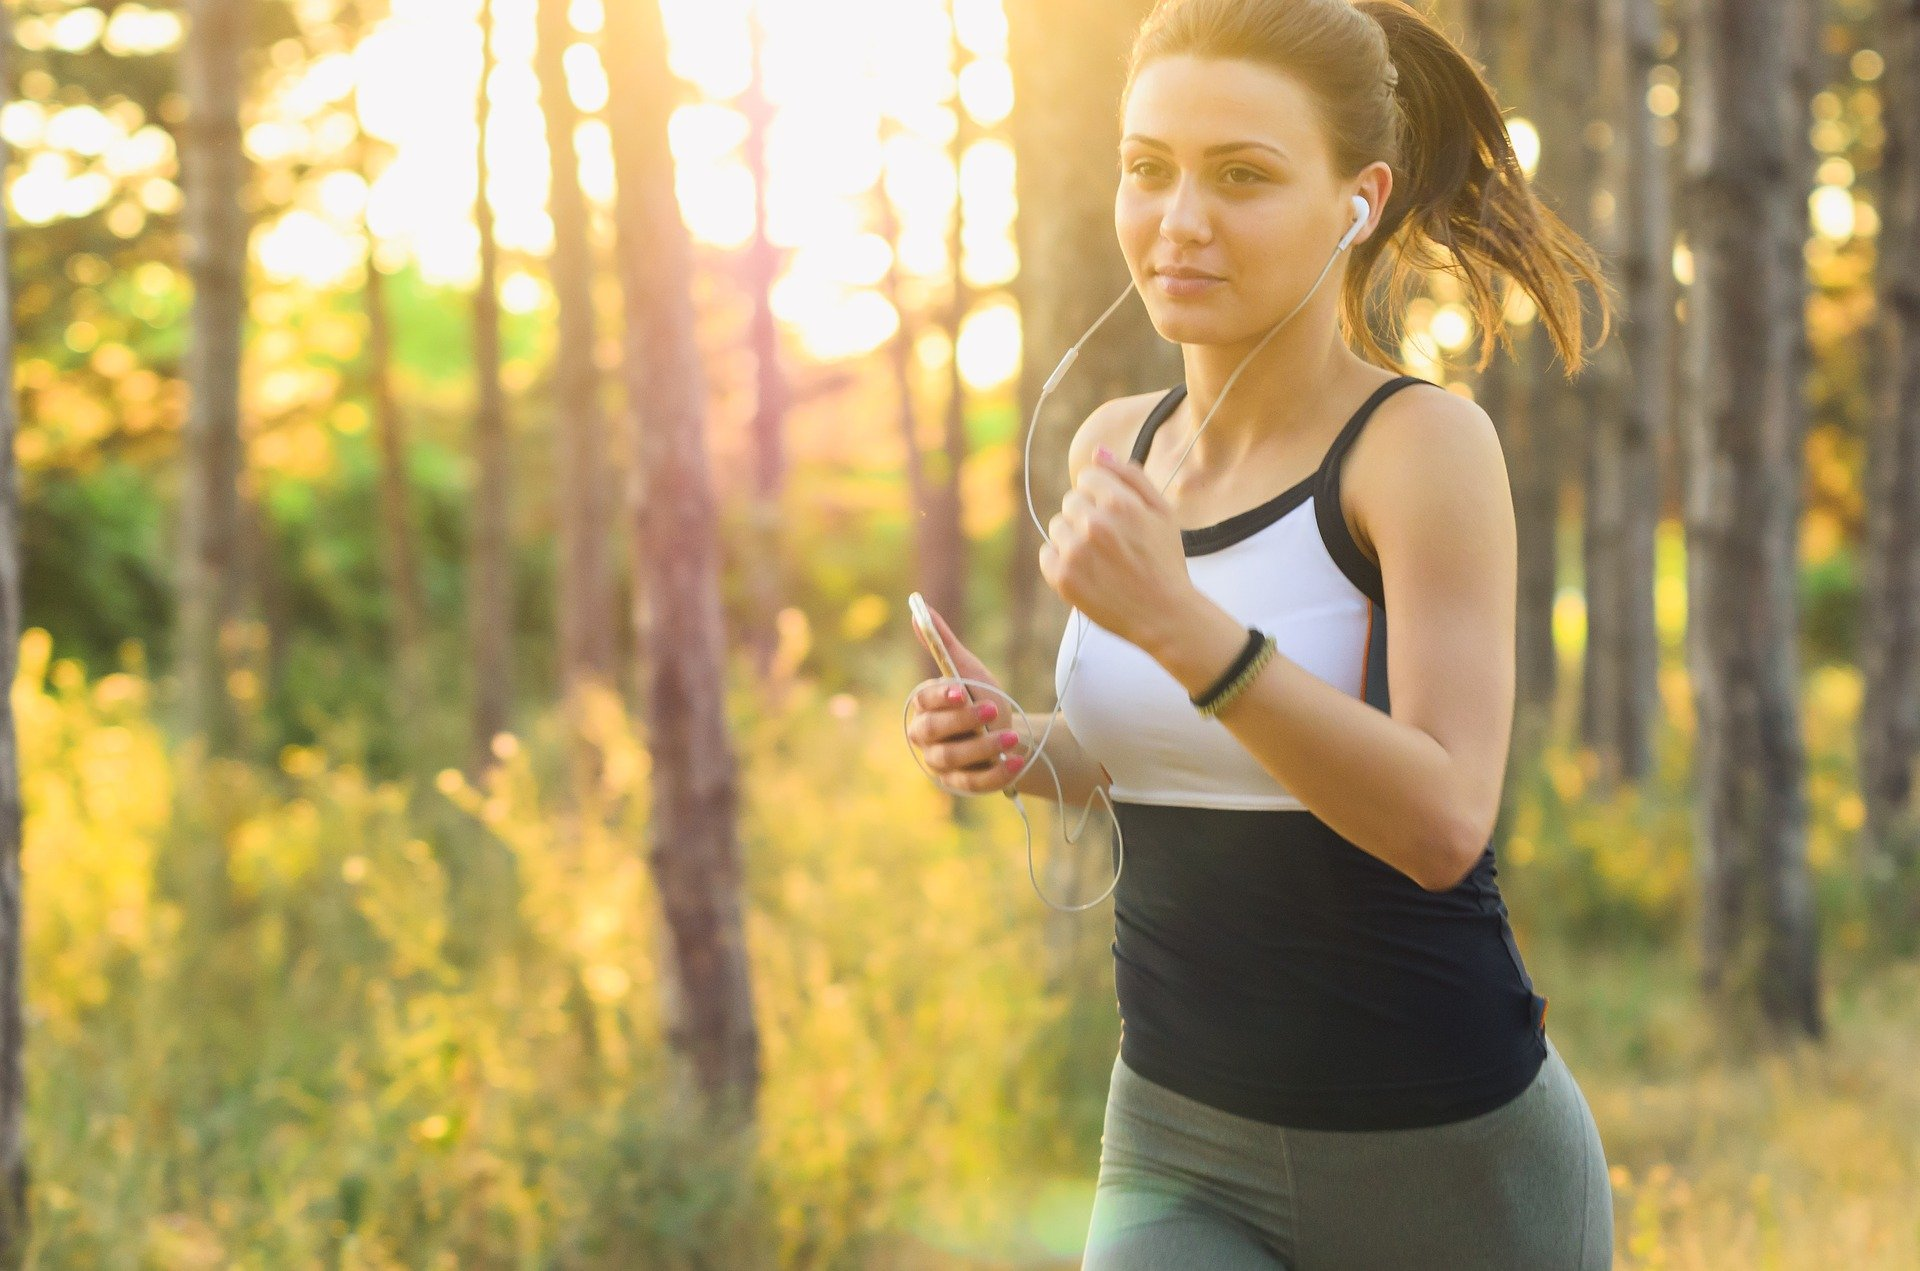 woman 2592247 1920 걷기 VS 달리기 : 진정한 승자는 누구일까?